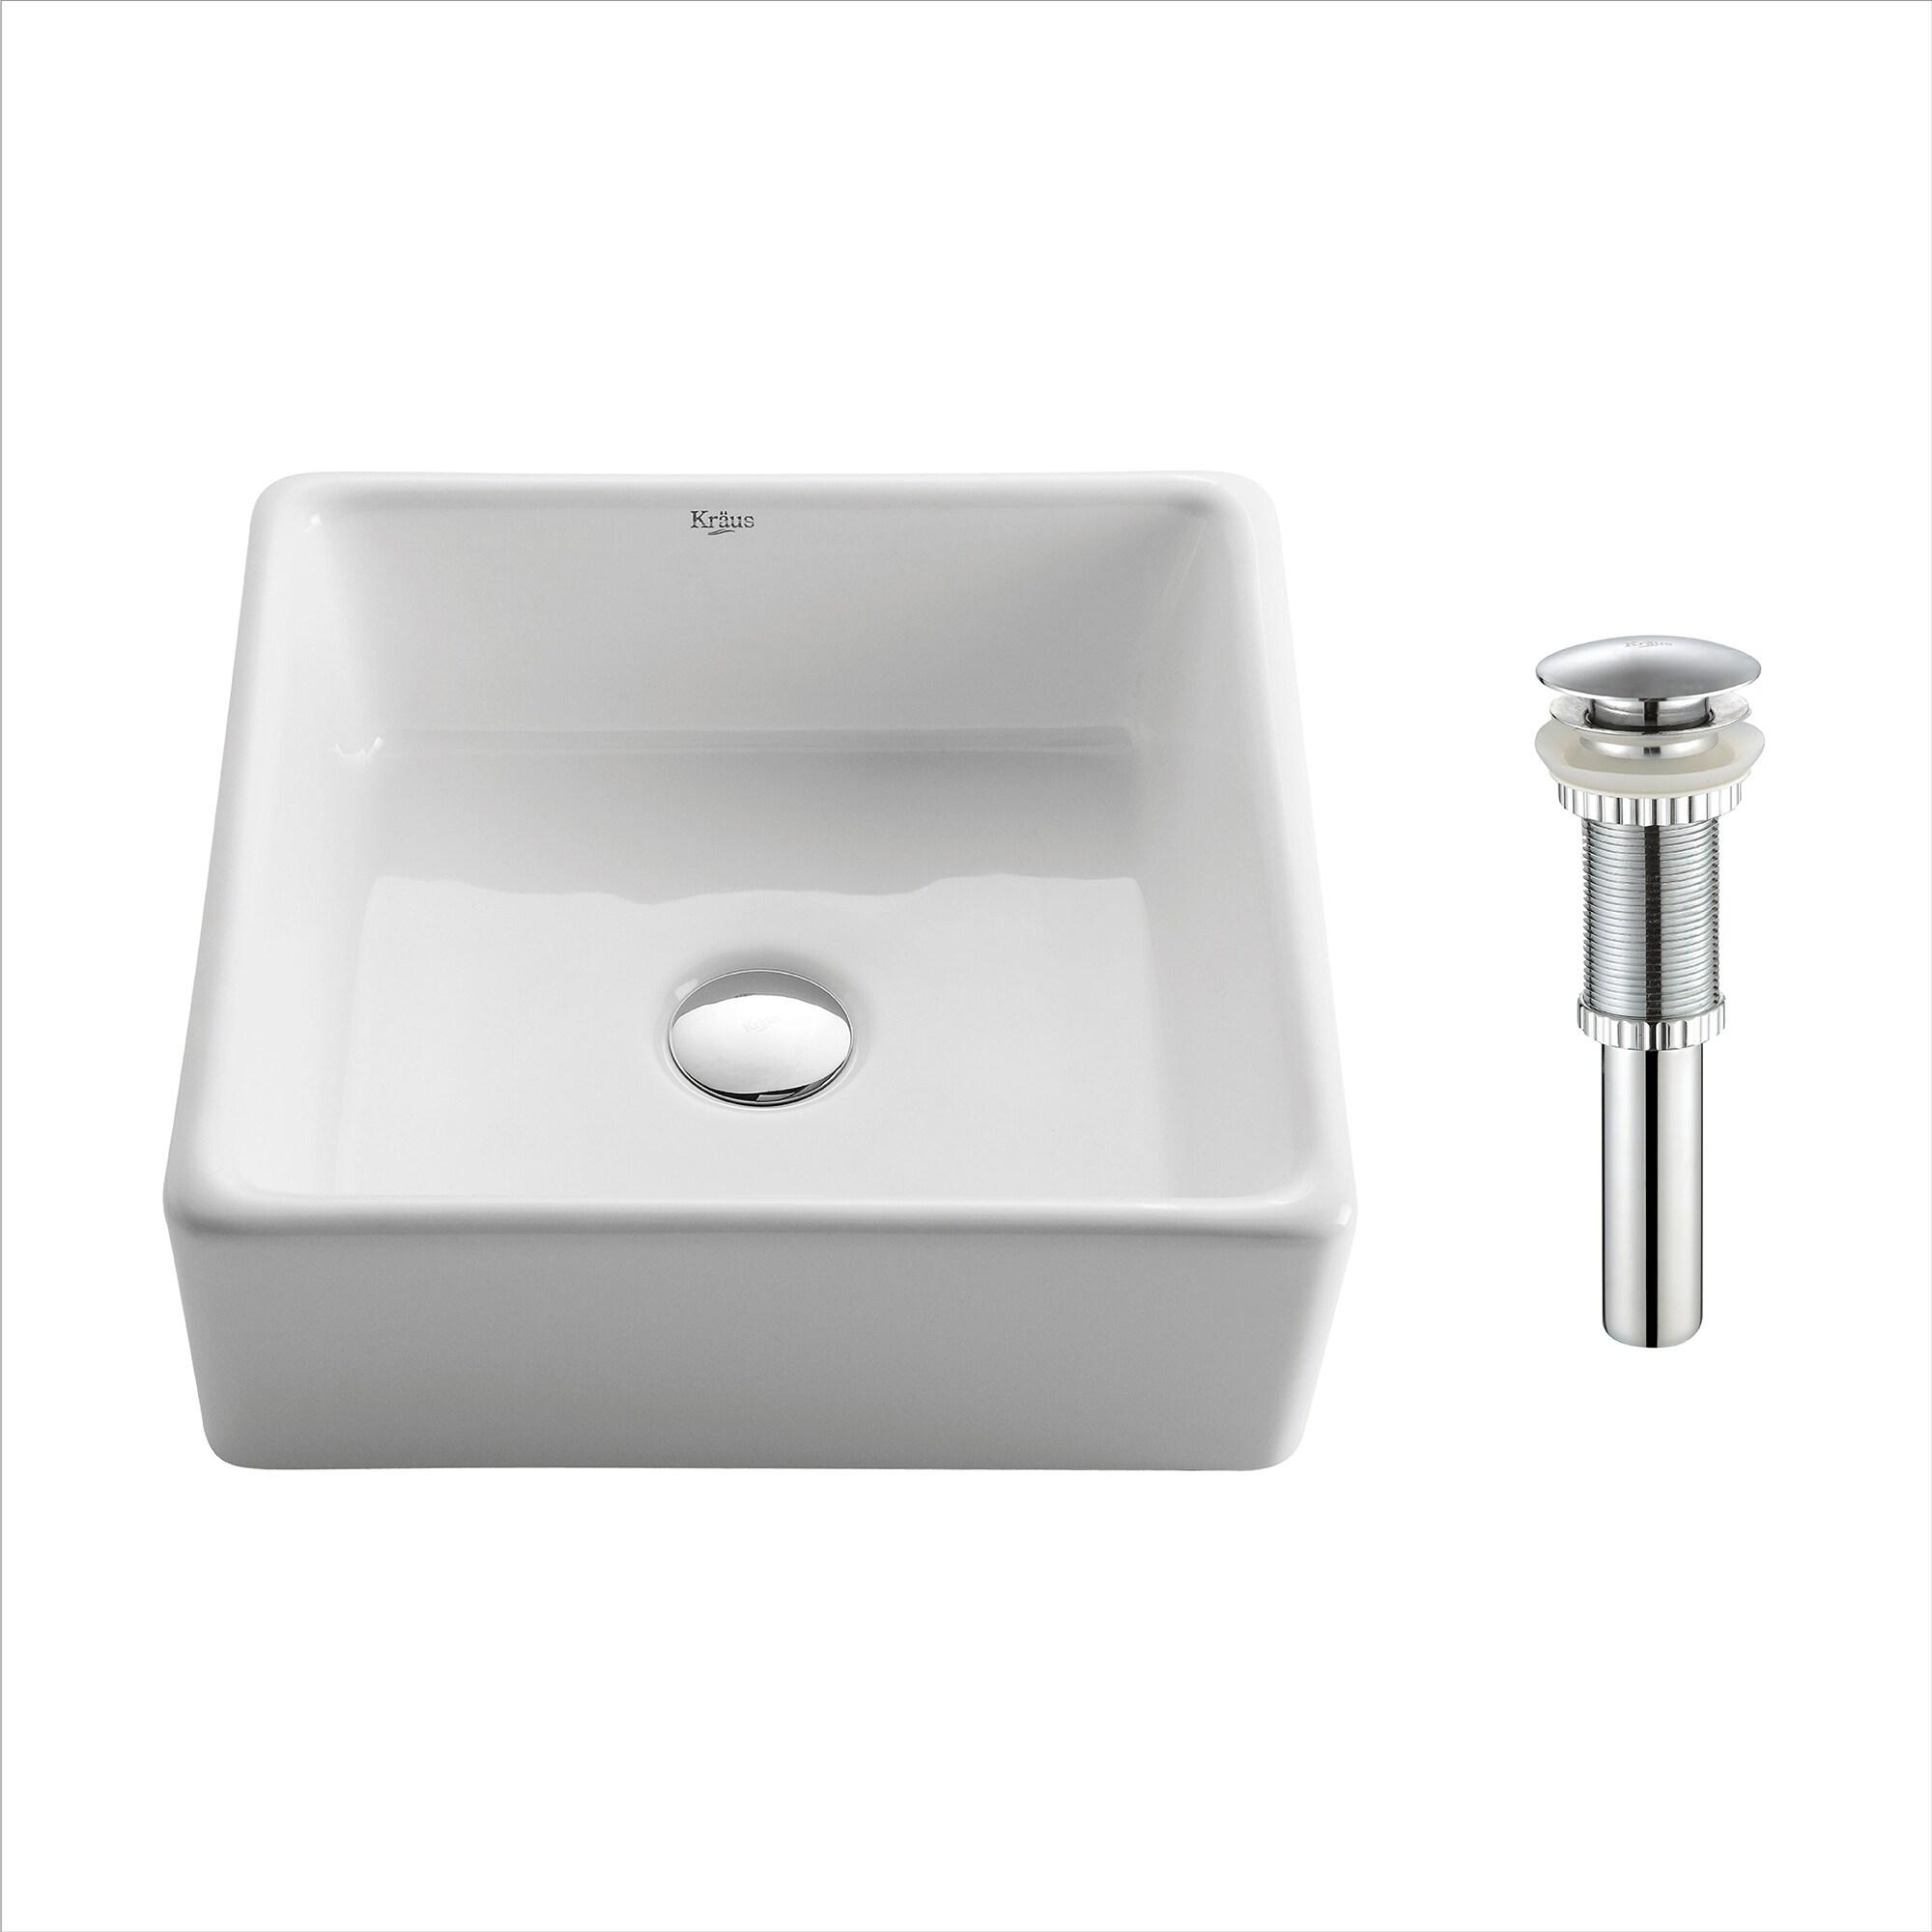 Kraus Elavo 15 inch Square Porcelain Ceramic Vessel Bathroom Sink